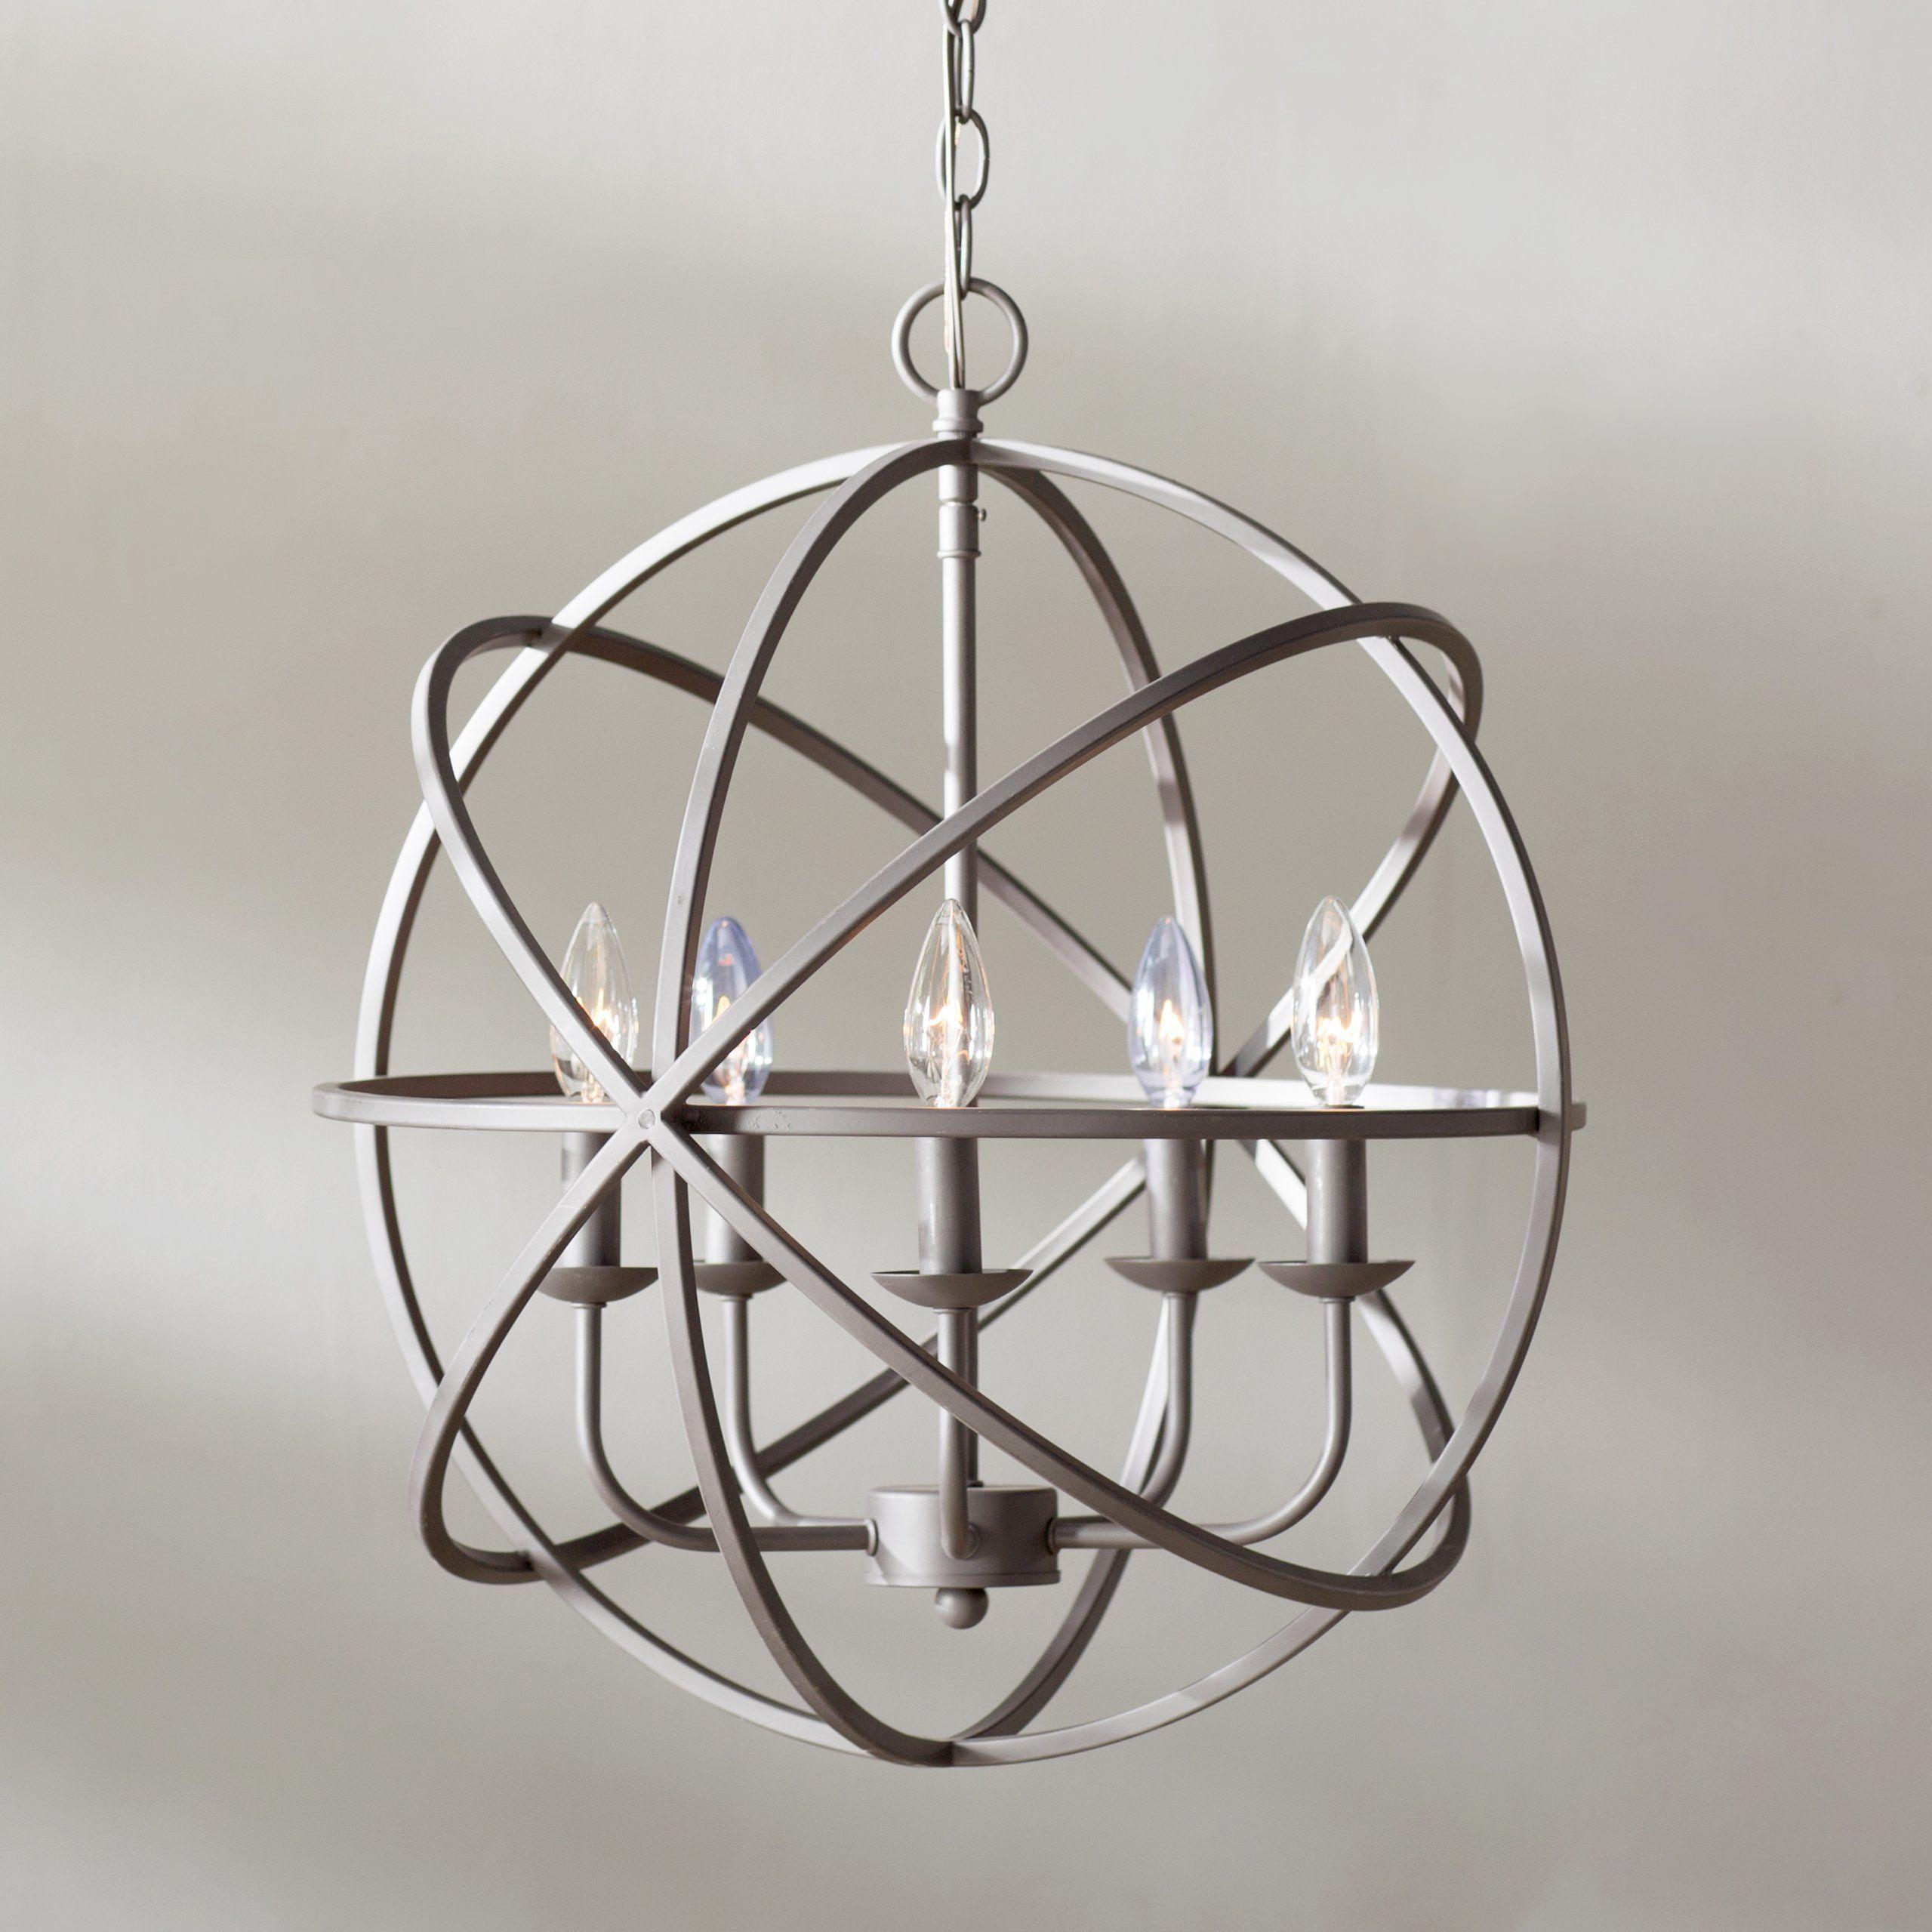 Hankinson 5Light Candle Style Globe Chandelier